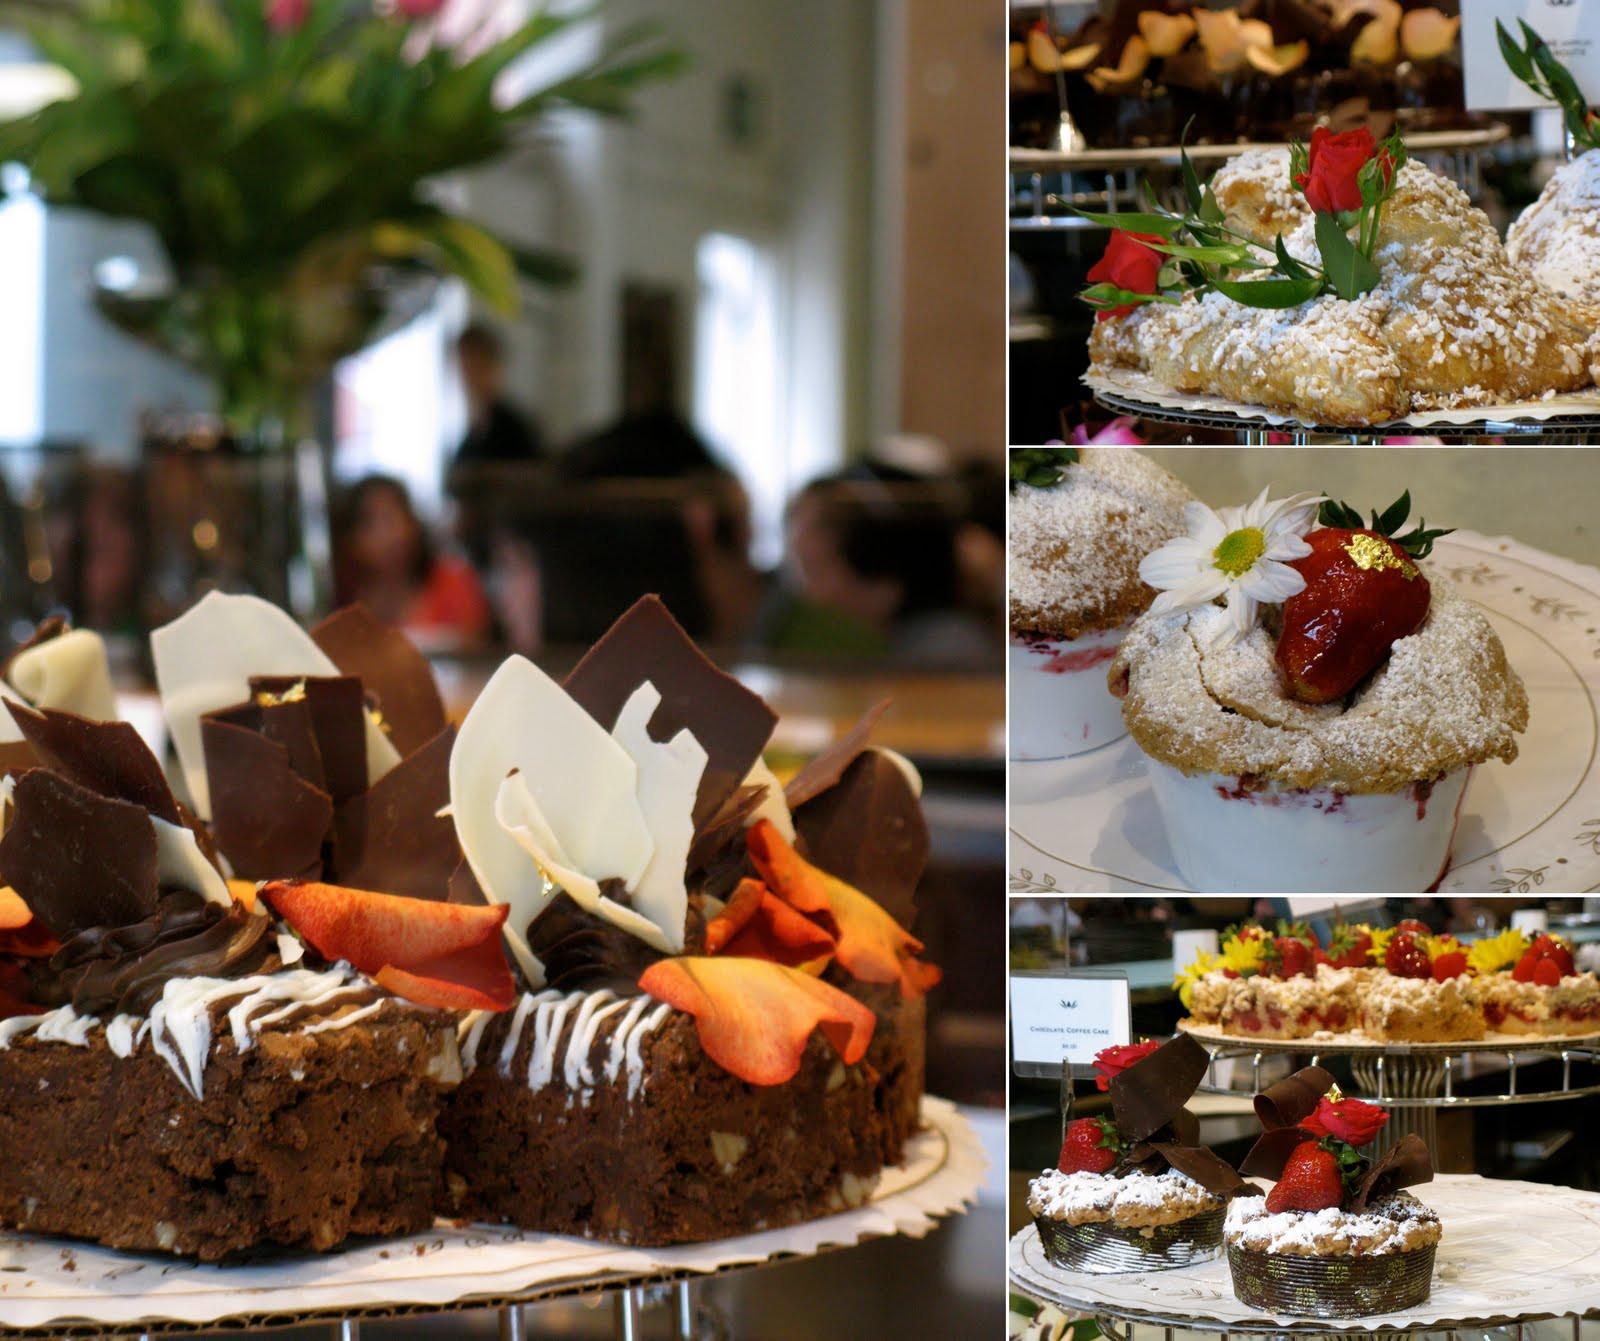 San Diego Desserts  The Cilantropist Extraordinary Desserts